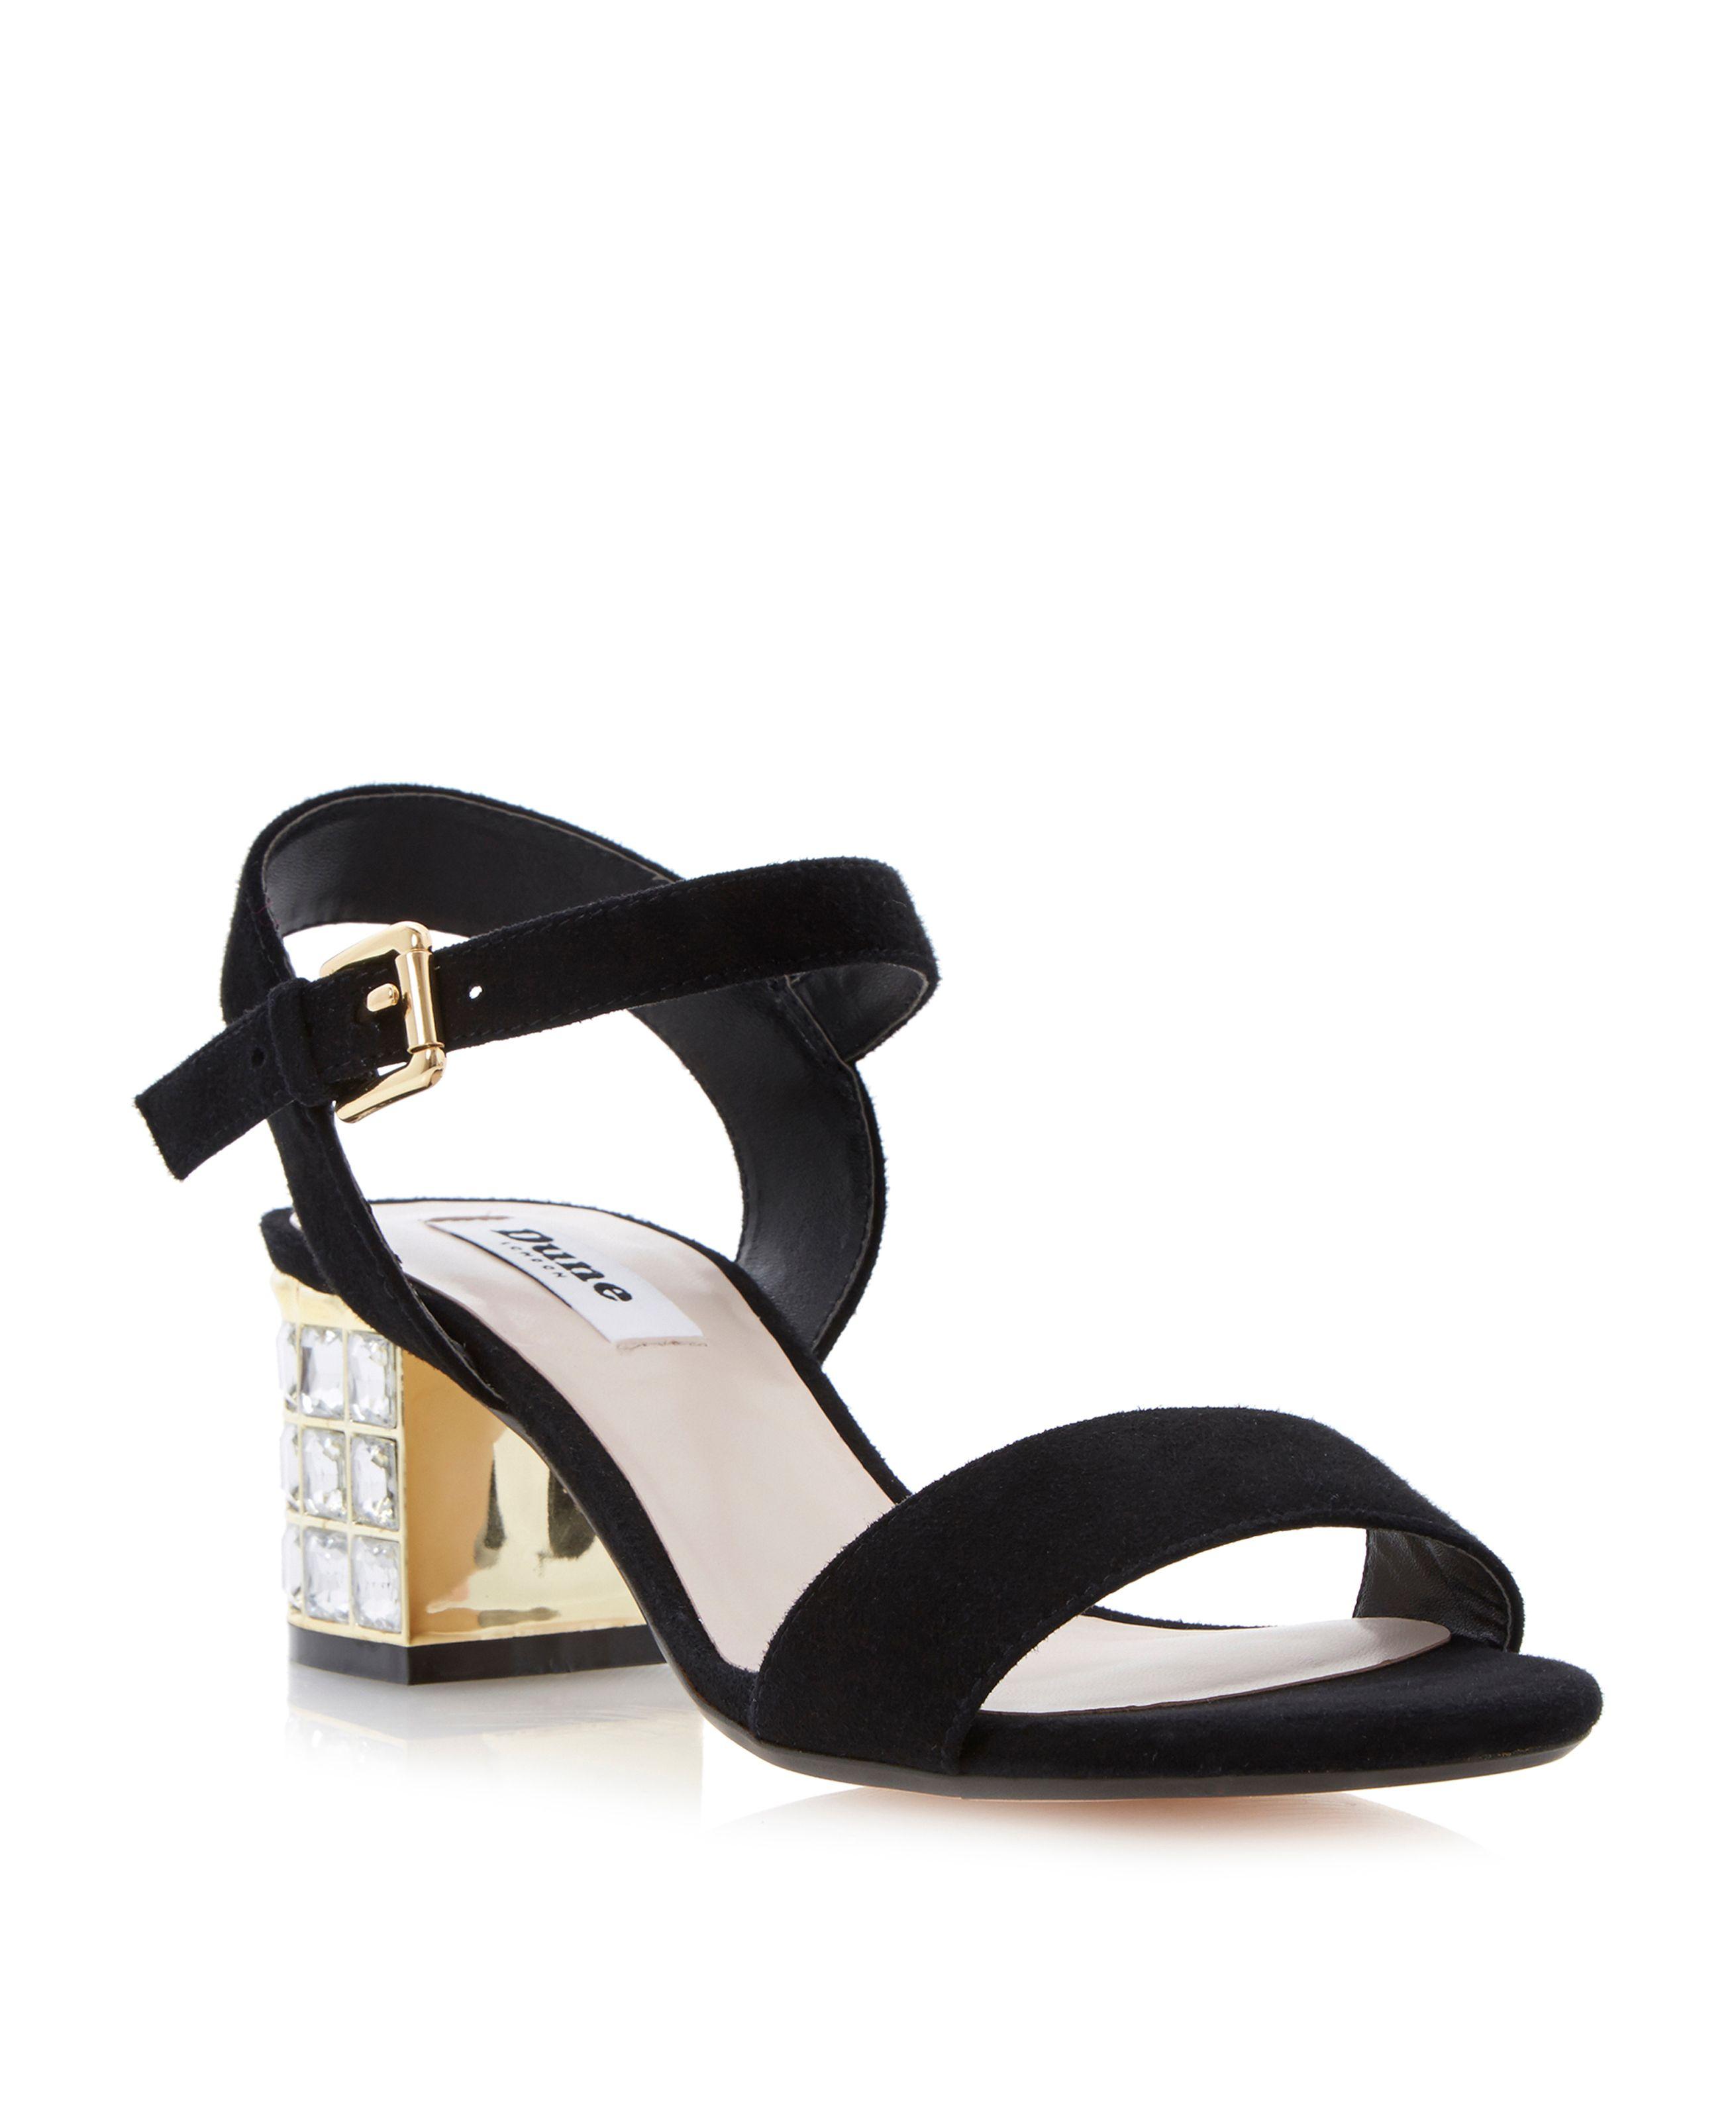 dune black sandals outlet 43799 caac2